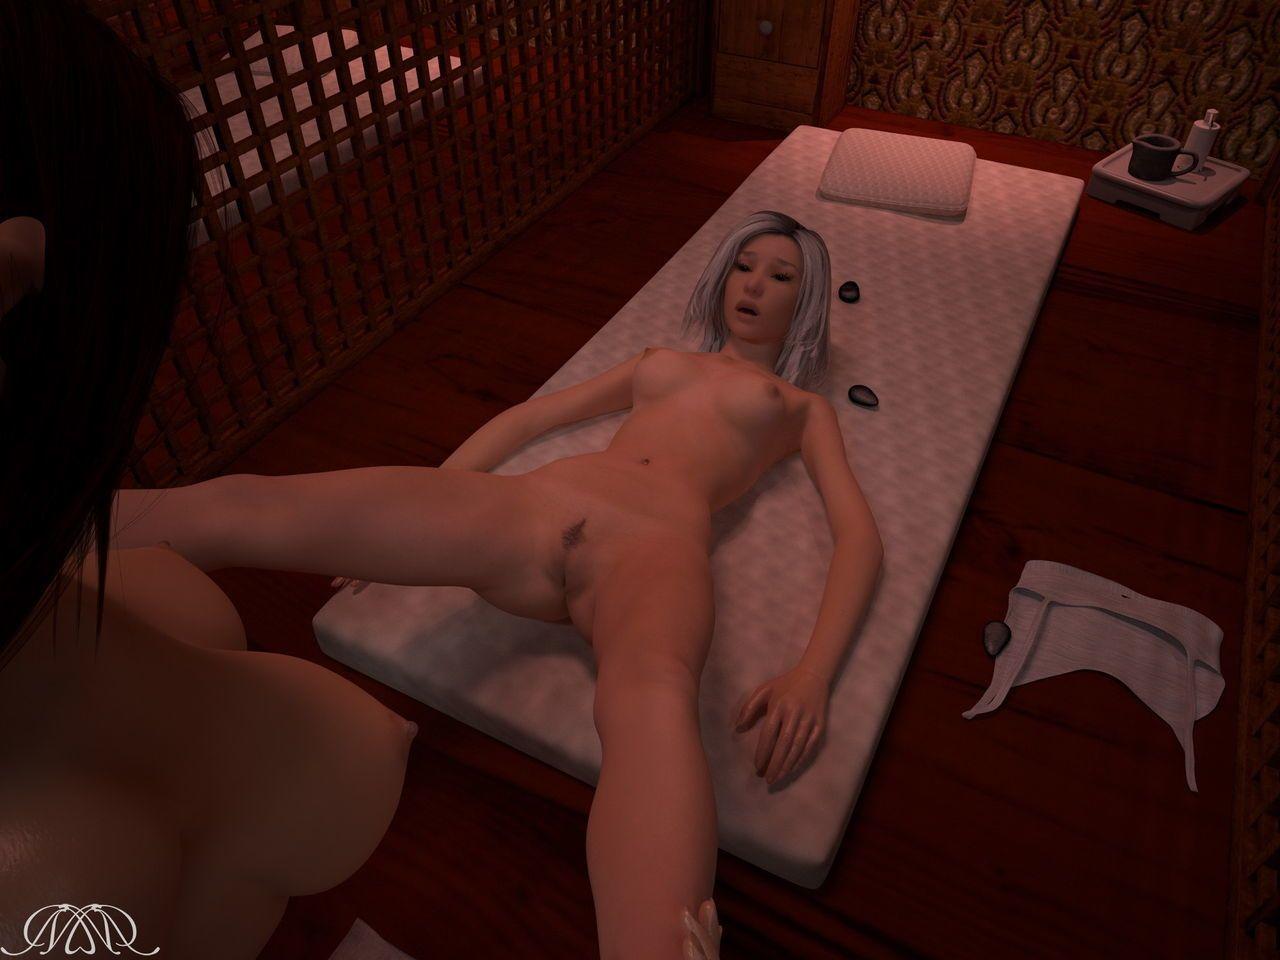 [Morfium] Afterwork Massage - part 9